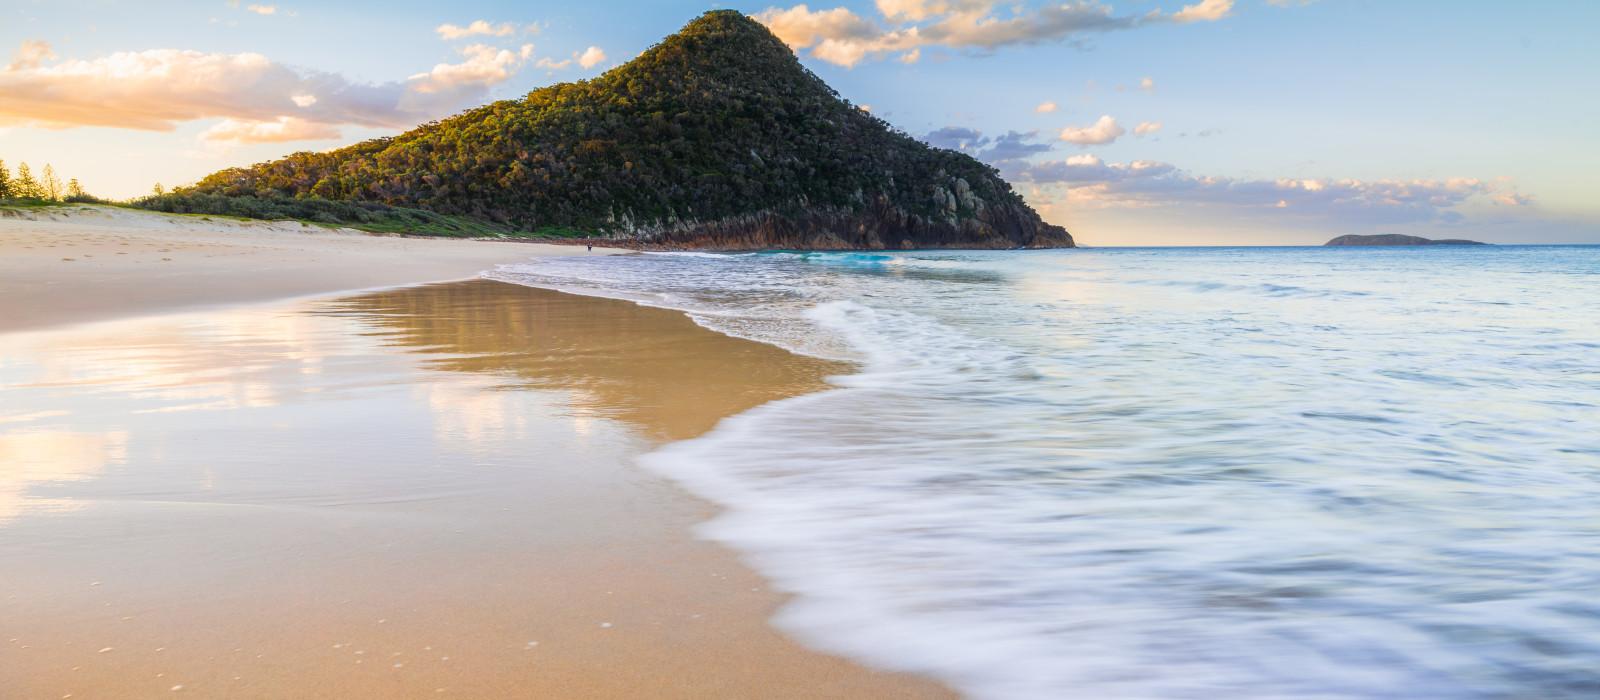 Destination Port Stephens Australia